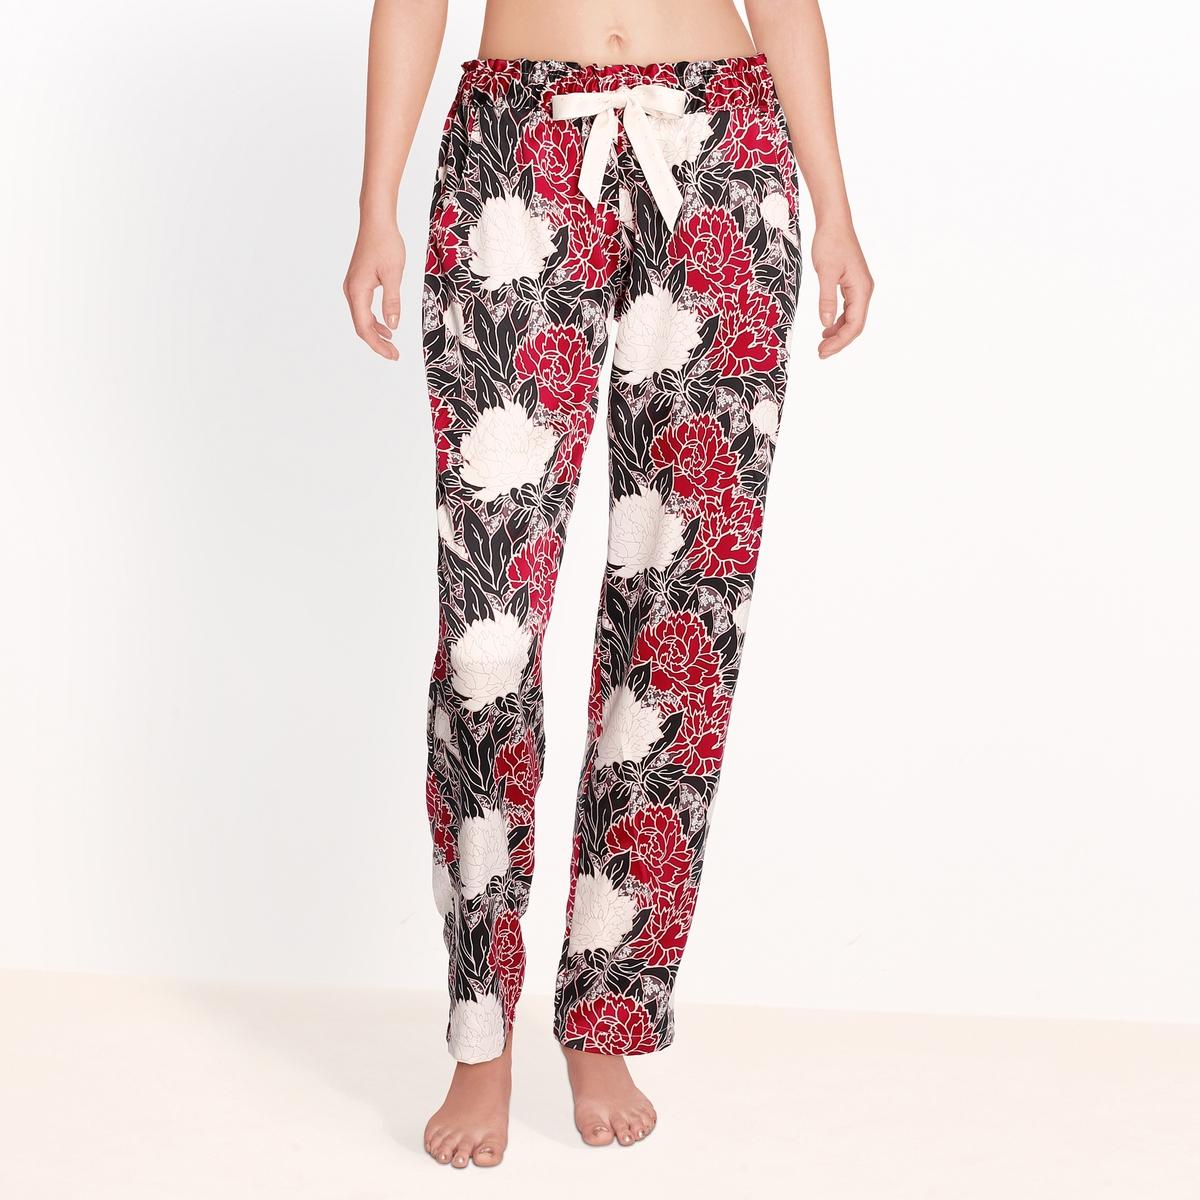 Брюки от пижамы сатиновые, Season of dreams пижамы пижамы пижамы пижамы женские пижамы женская пижама женская пижама женская b541102112 5